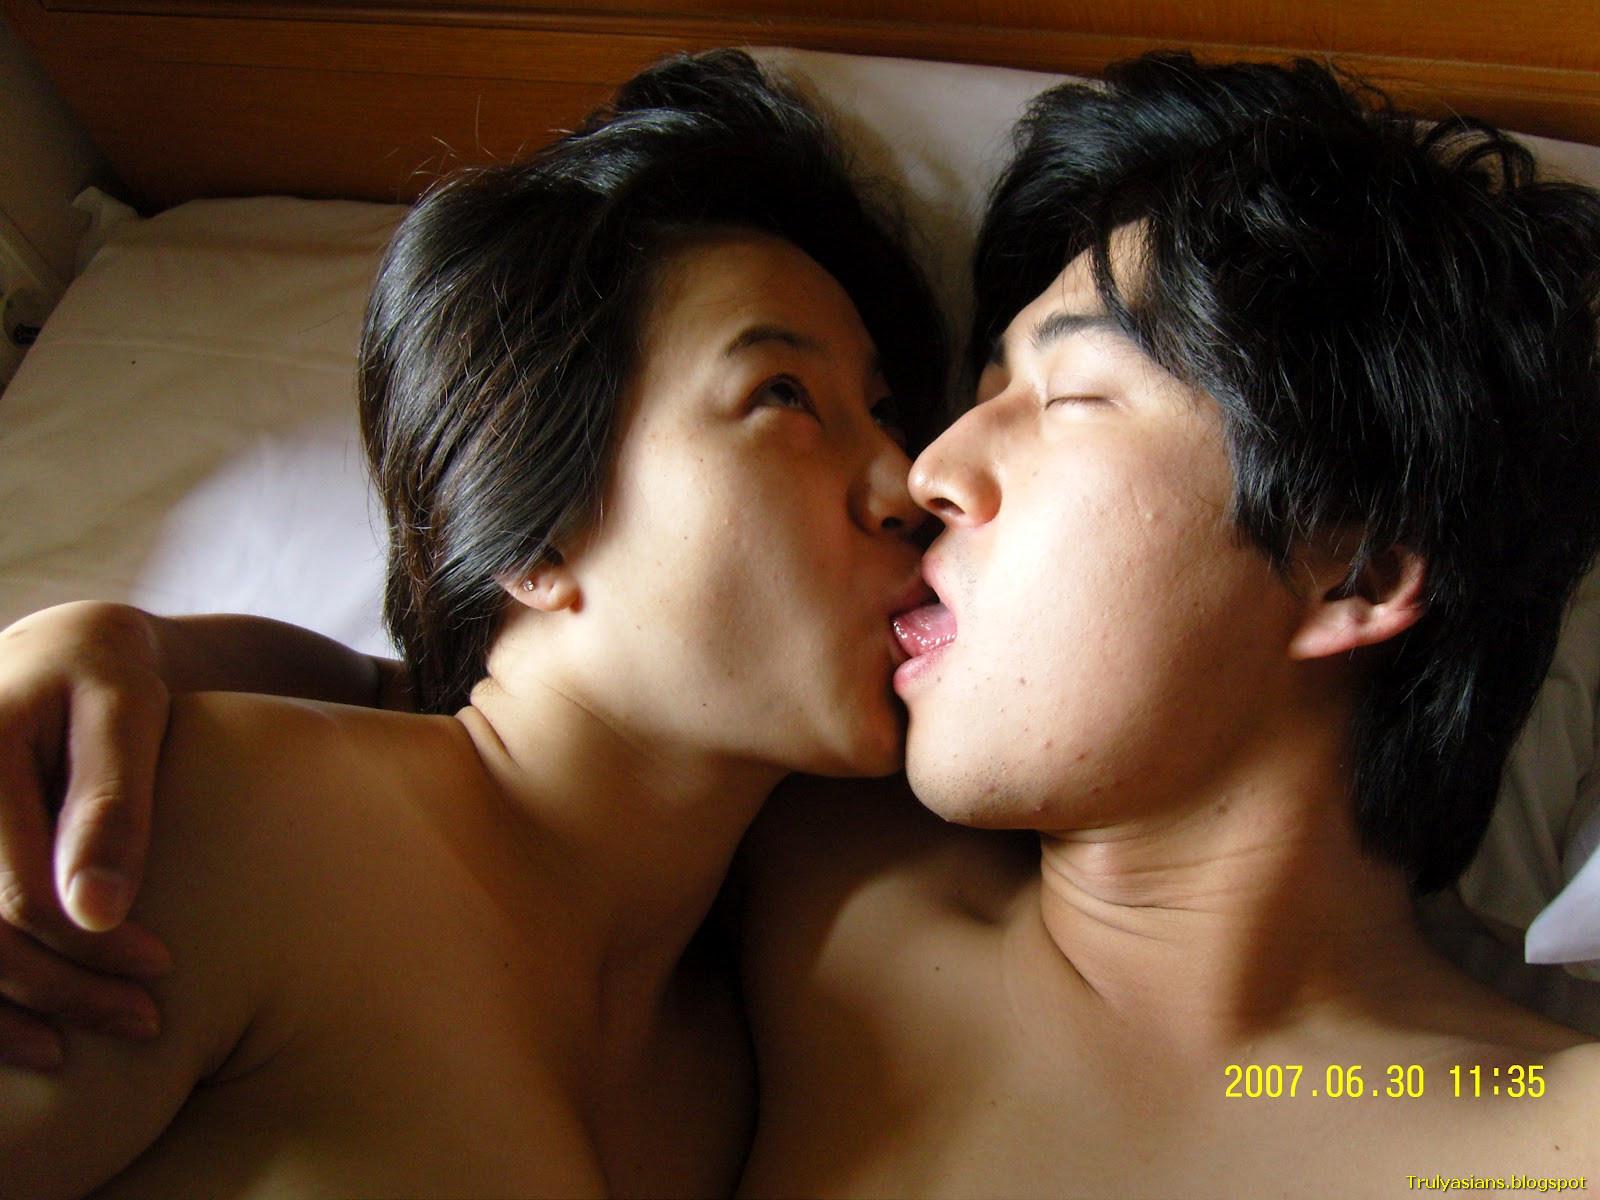 leak korean girlfriend naked  Sexy Korean Girlfriend Leaked Photos (25 pics)